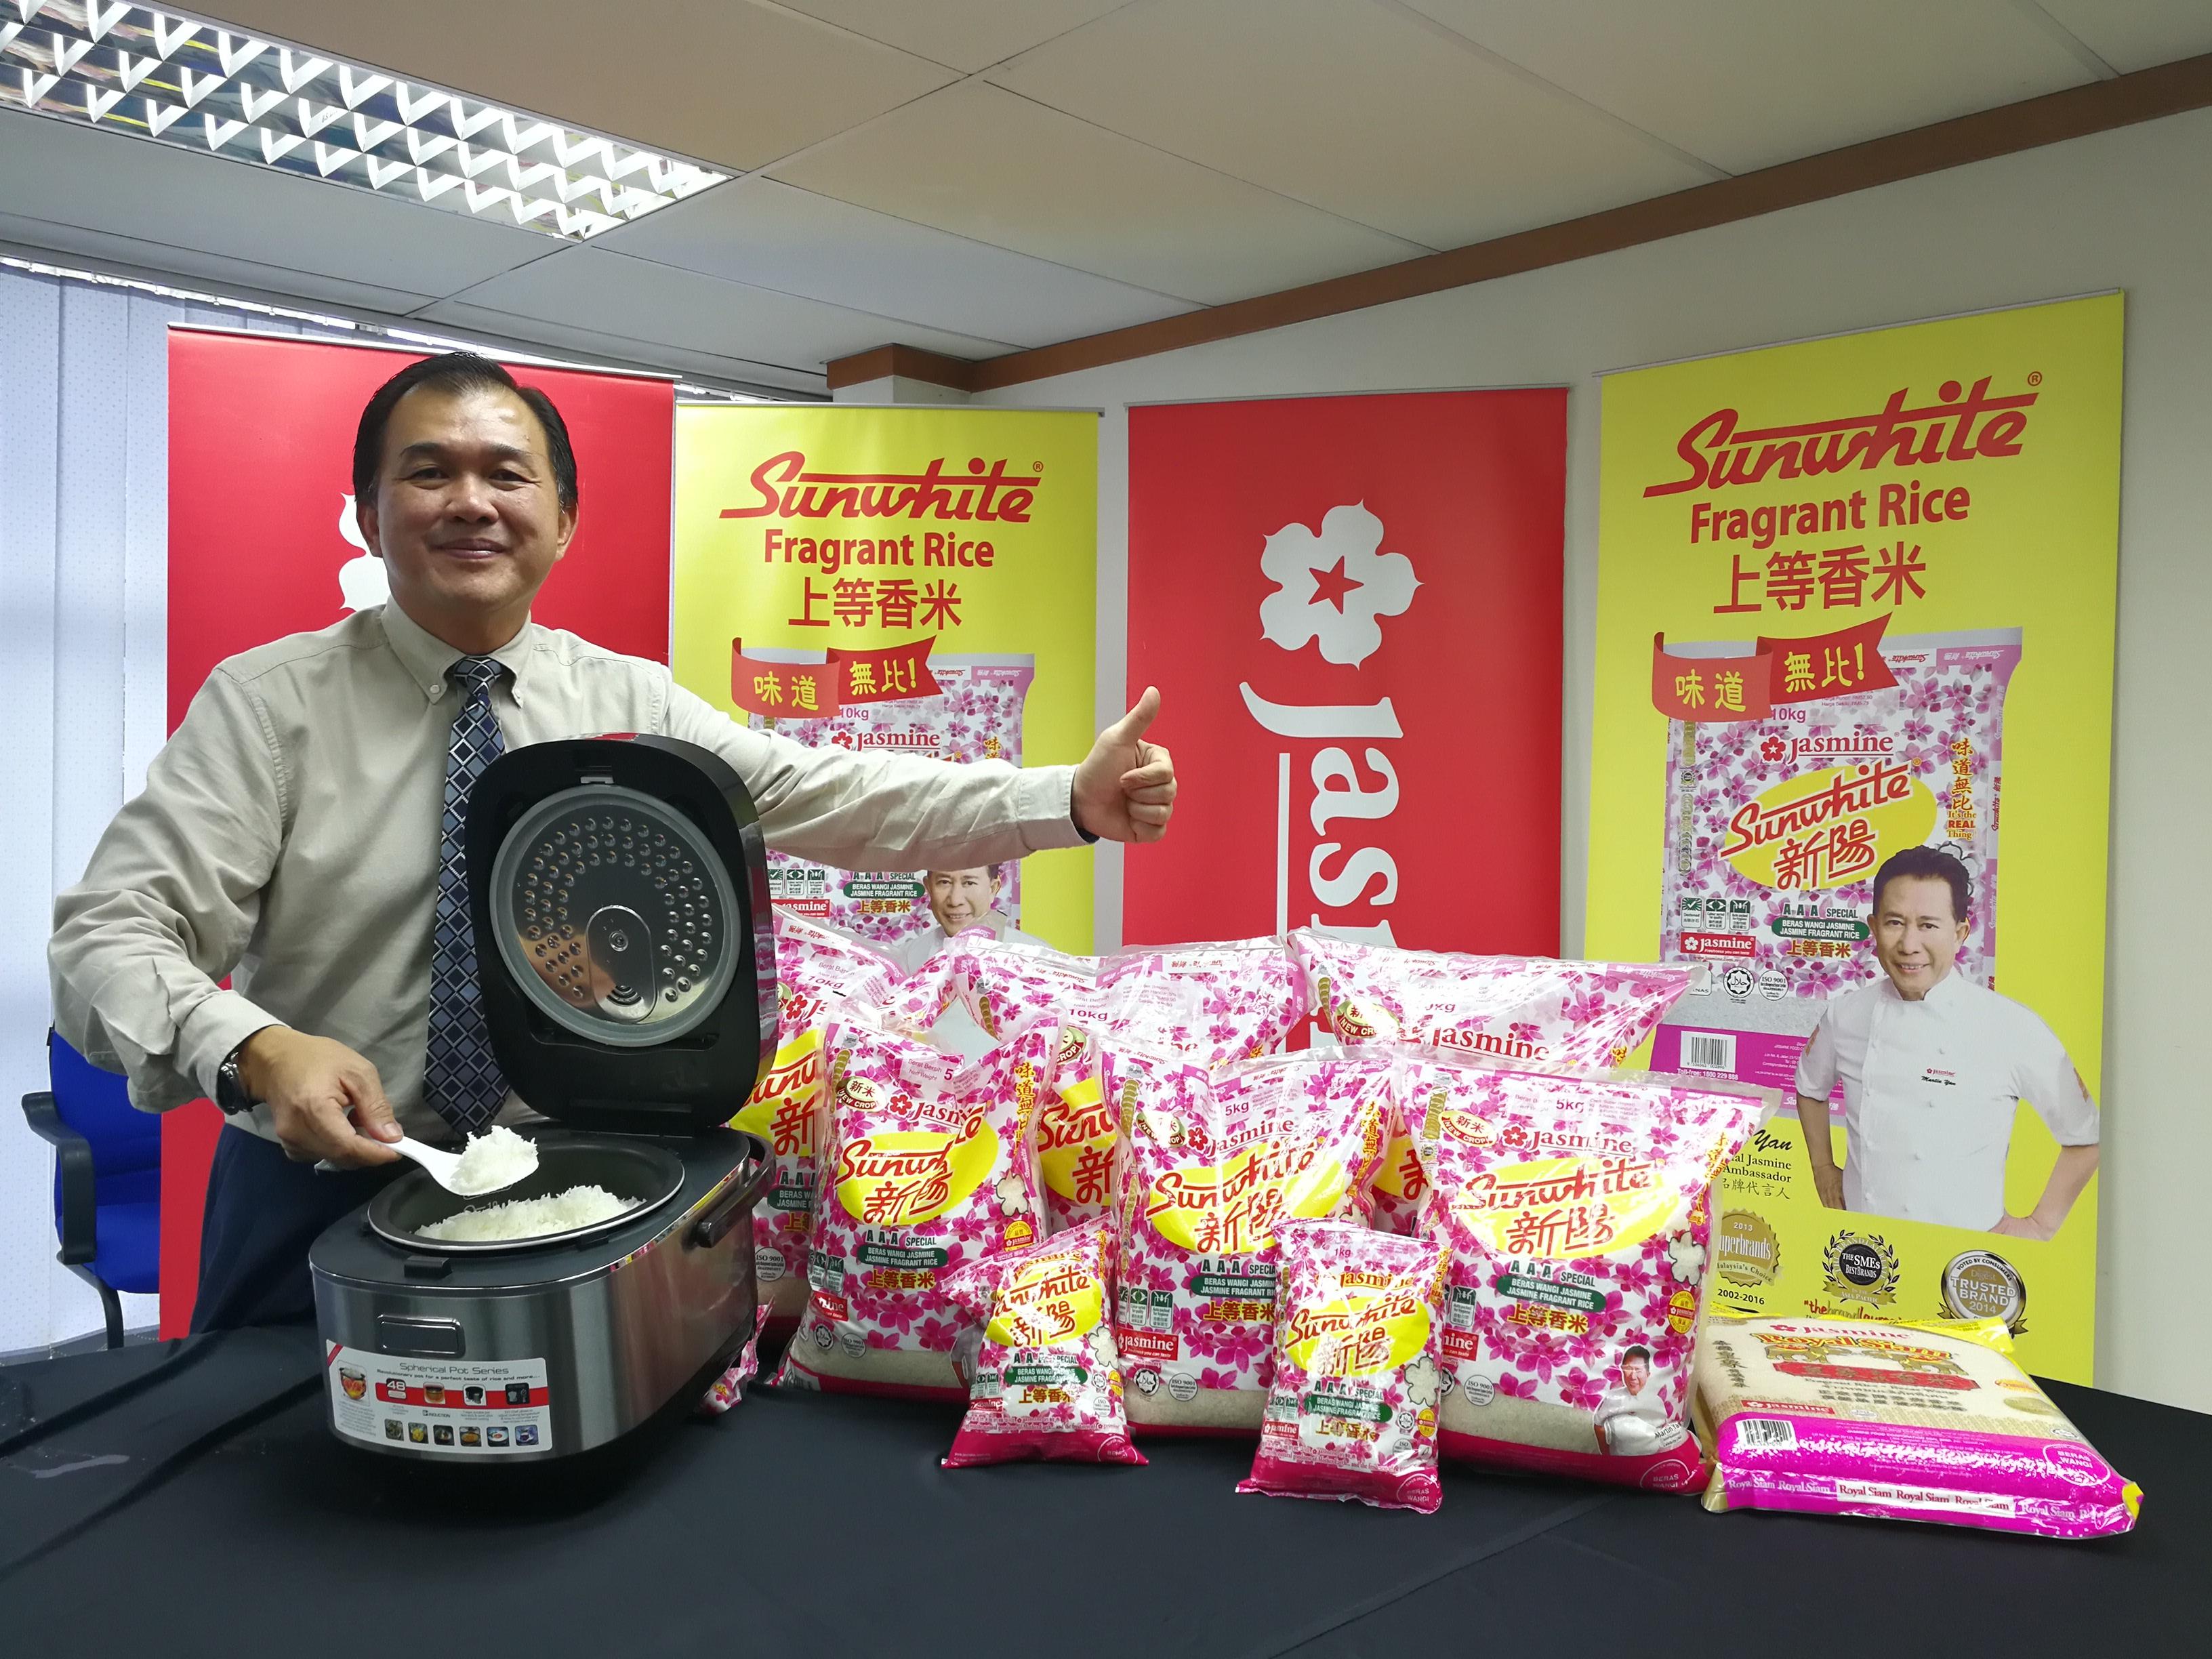 Jasmine食品机构有限公司首席执行员林瑞吉